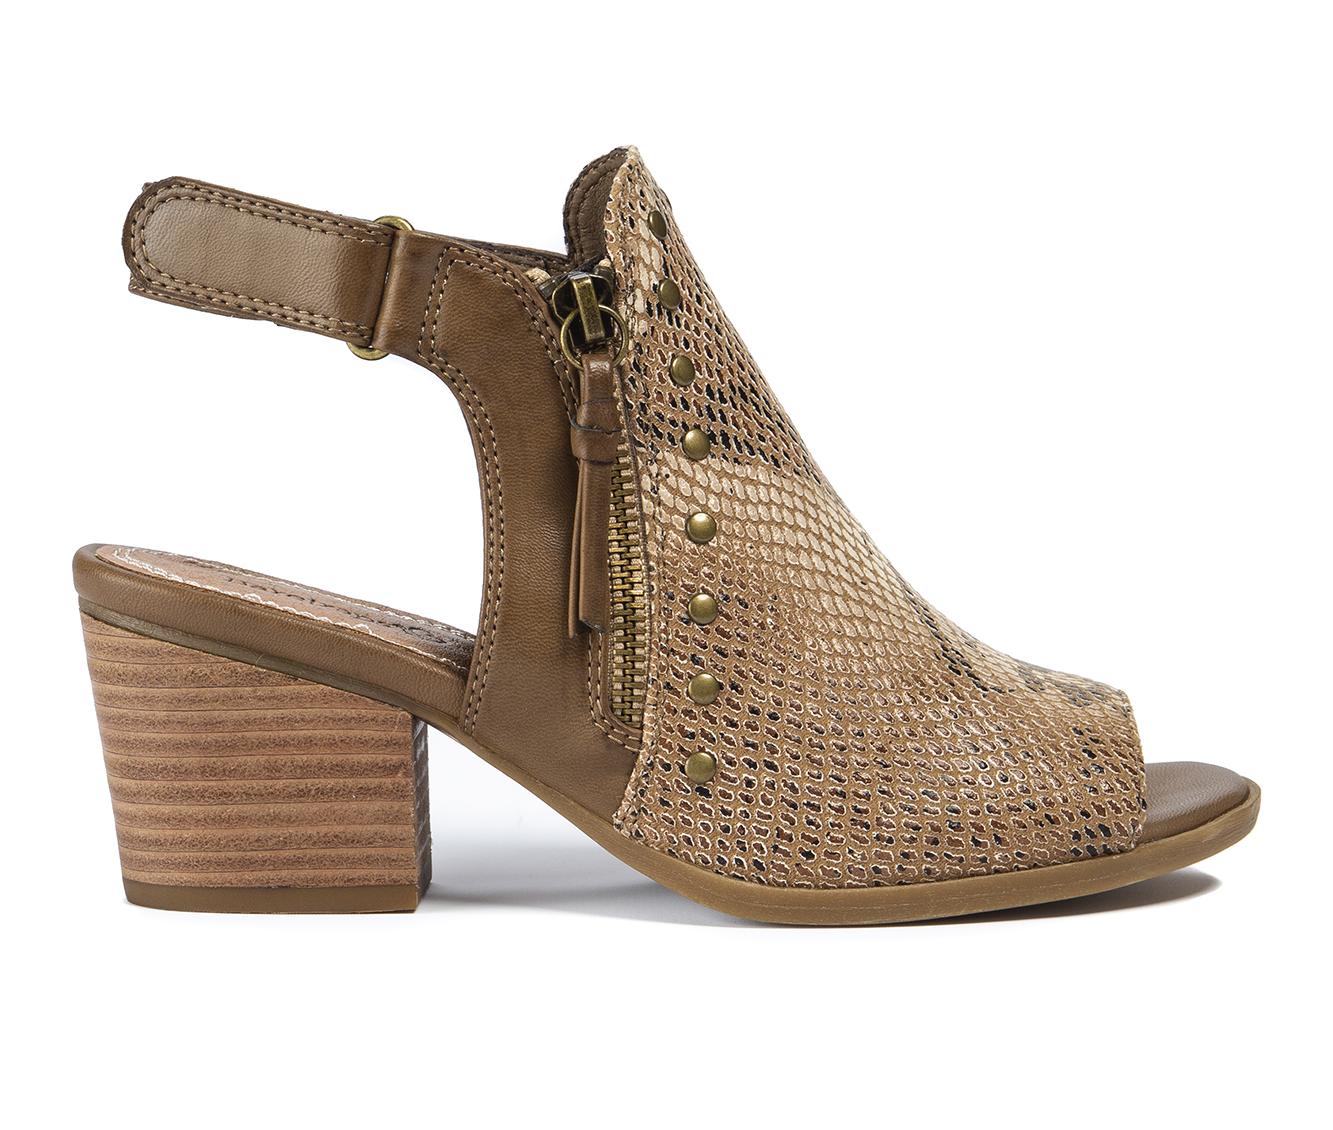 Baretraps Ivella Women's Dress Shoe (Brown Faux Leather)